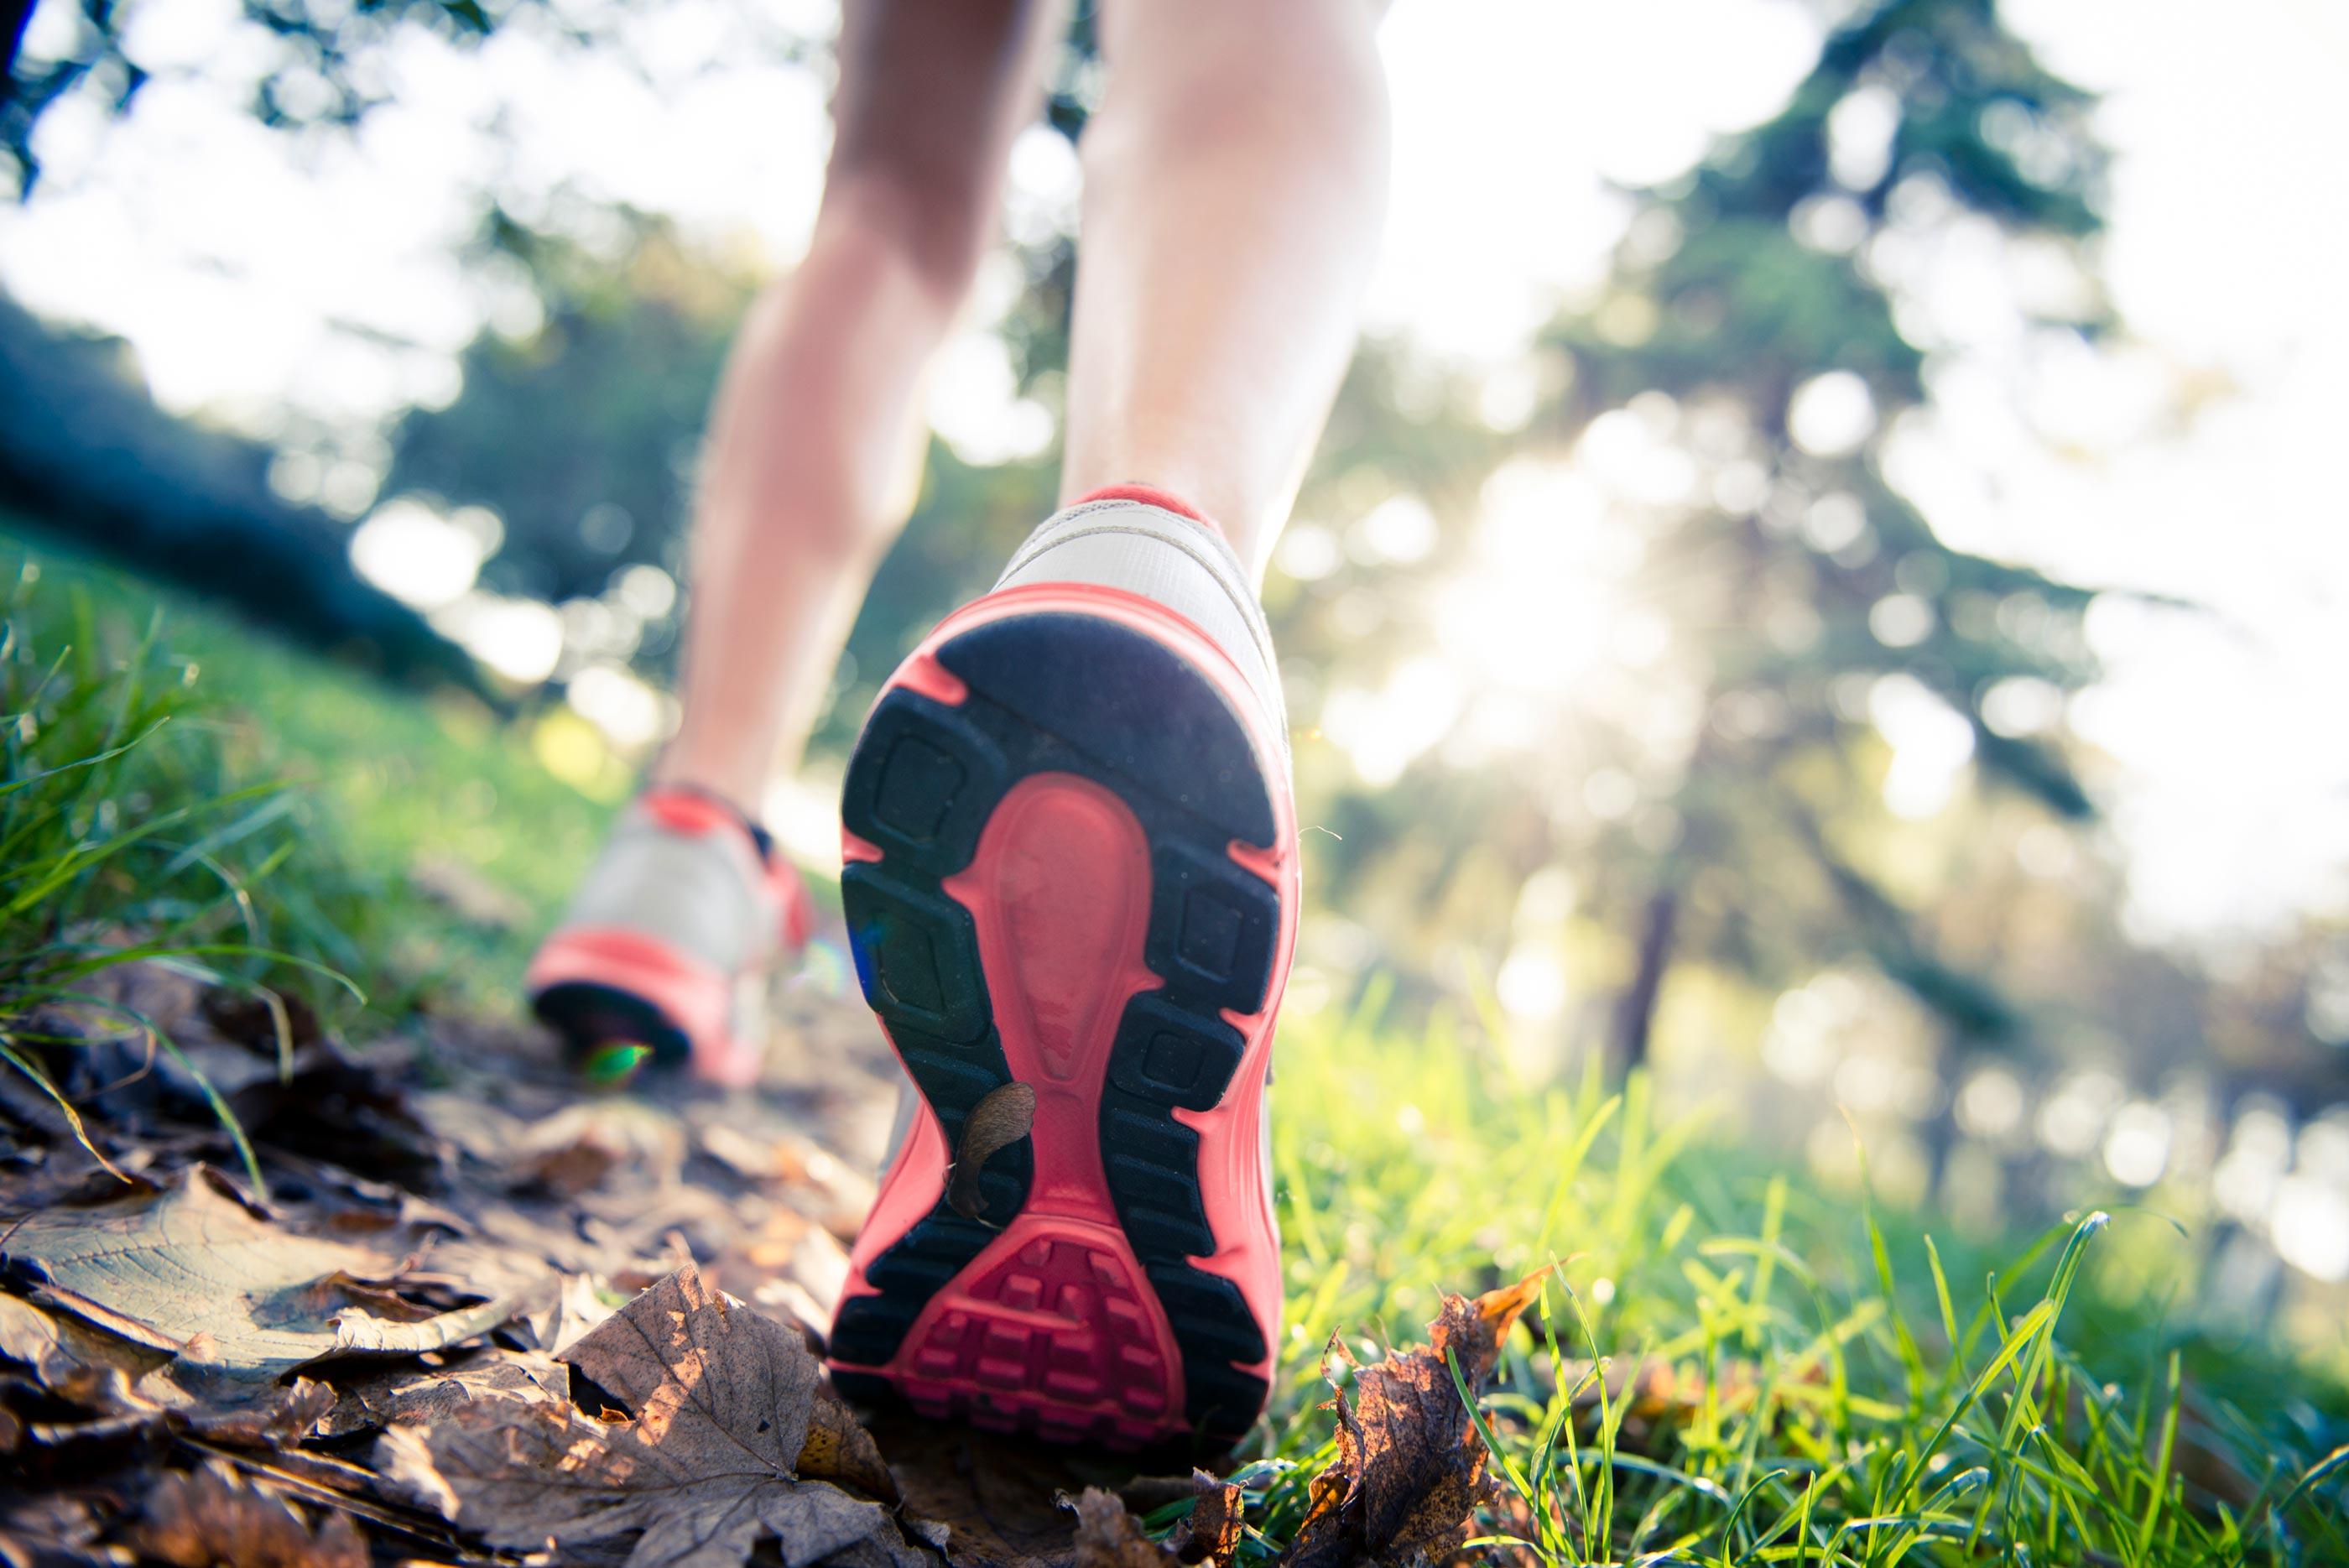 Läuferin-Park-Laub-Laufschuhe